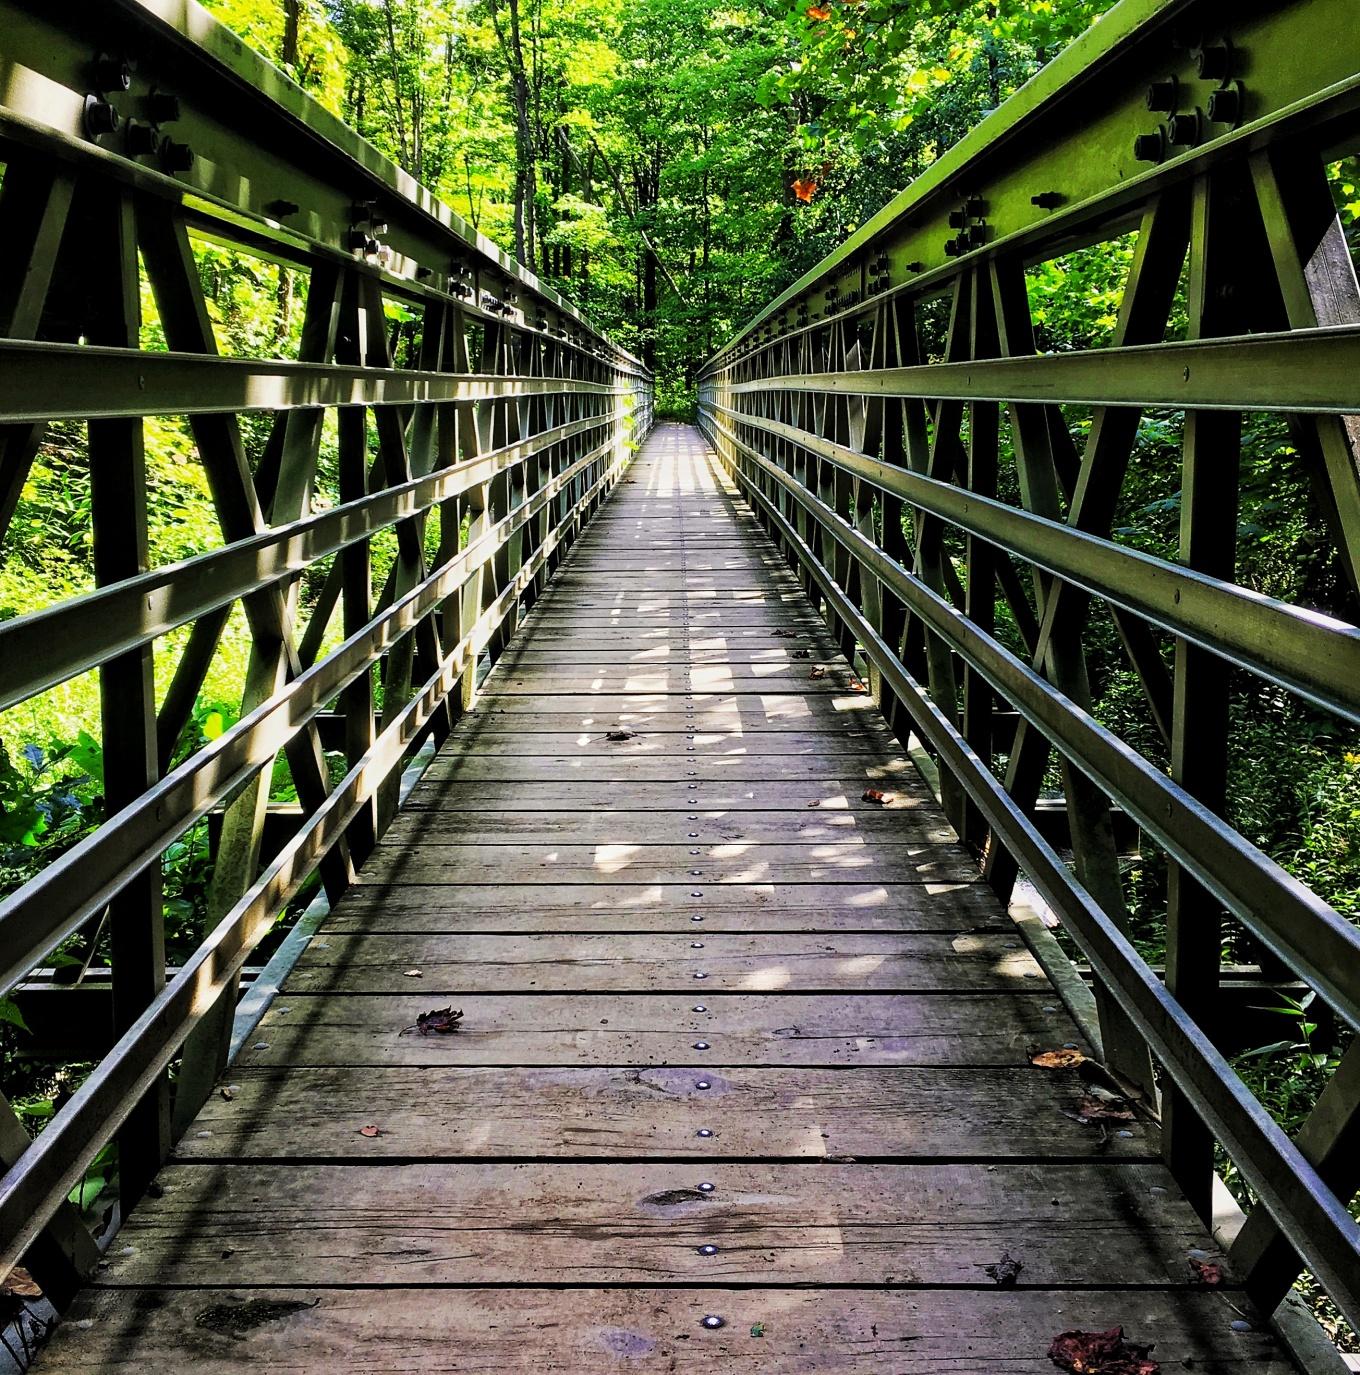 Footbridge in Cuyahoga Valley National Park, Ohio